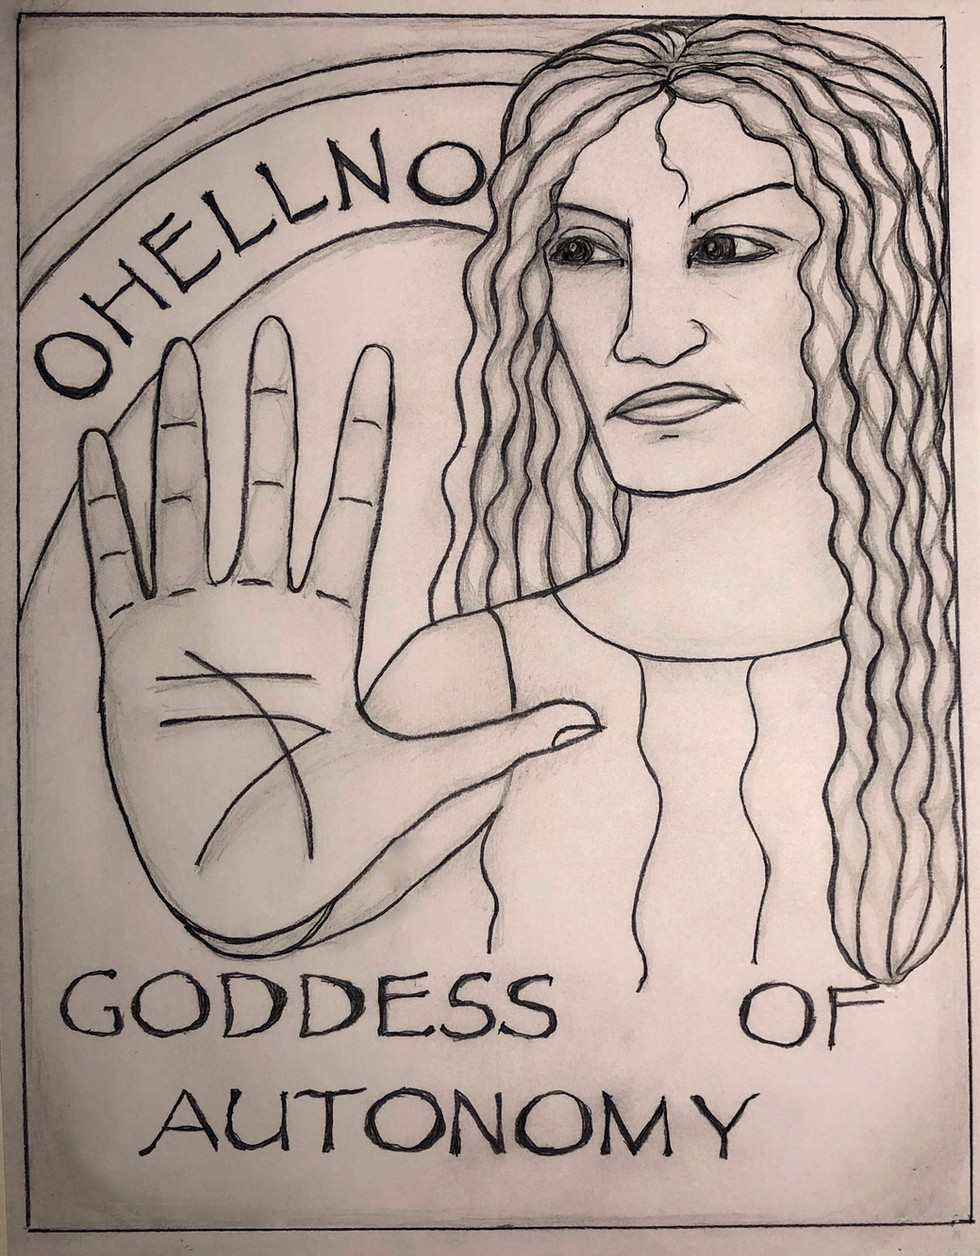 Goddess of Autonomy